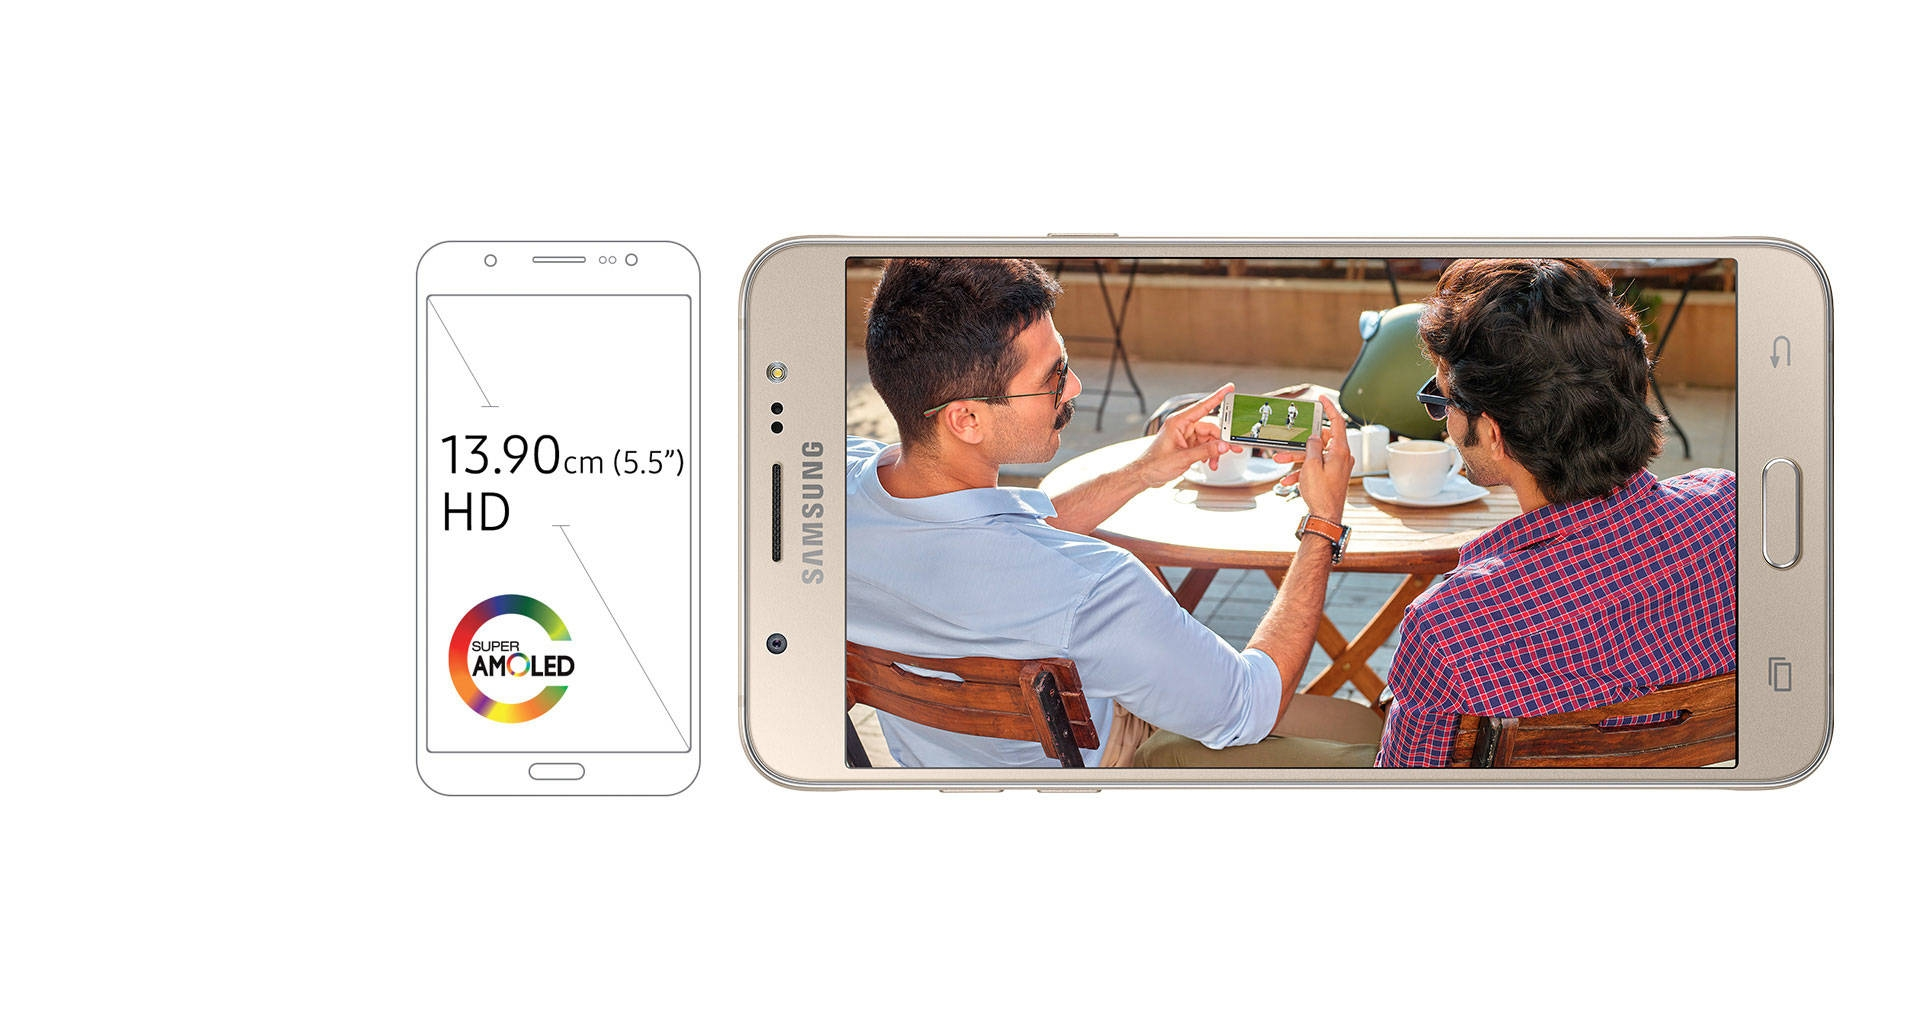 Samsung galaxy J7 2016 prix maroc,smartphone samsung,jumia